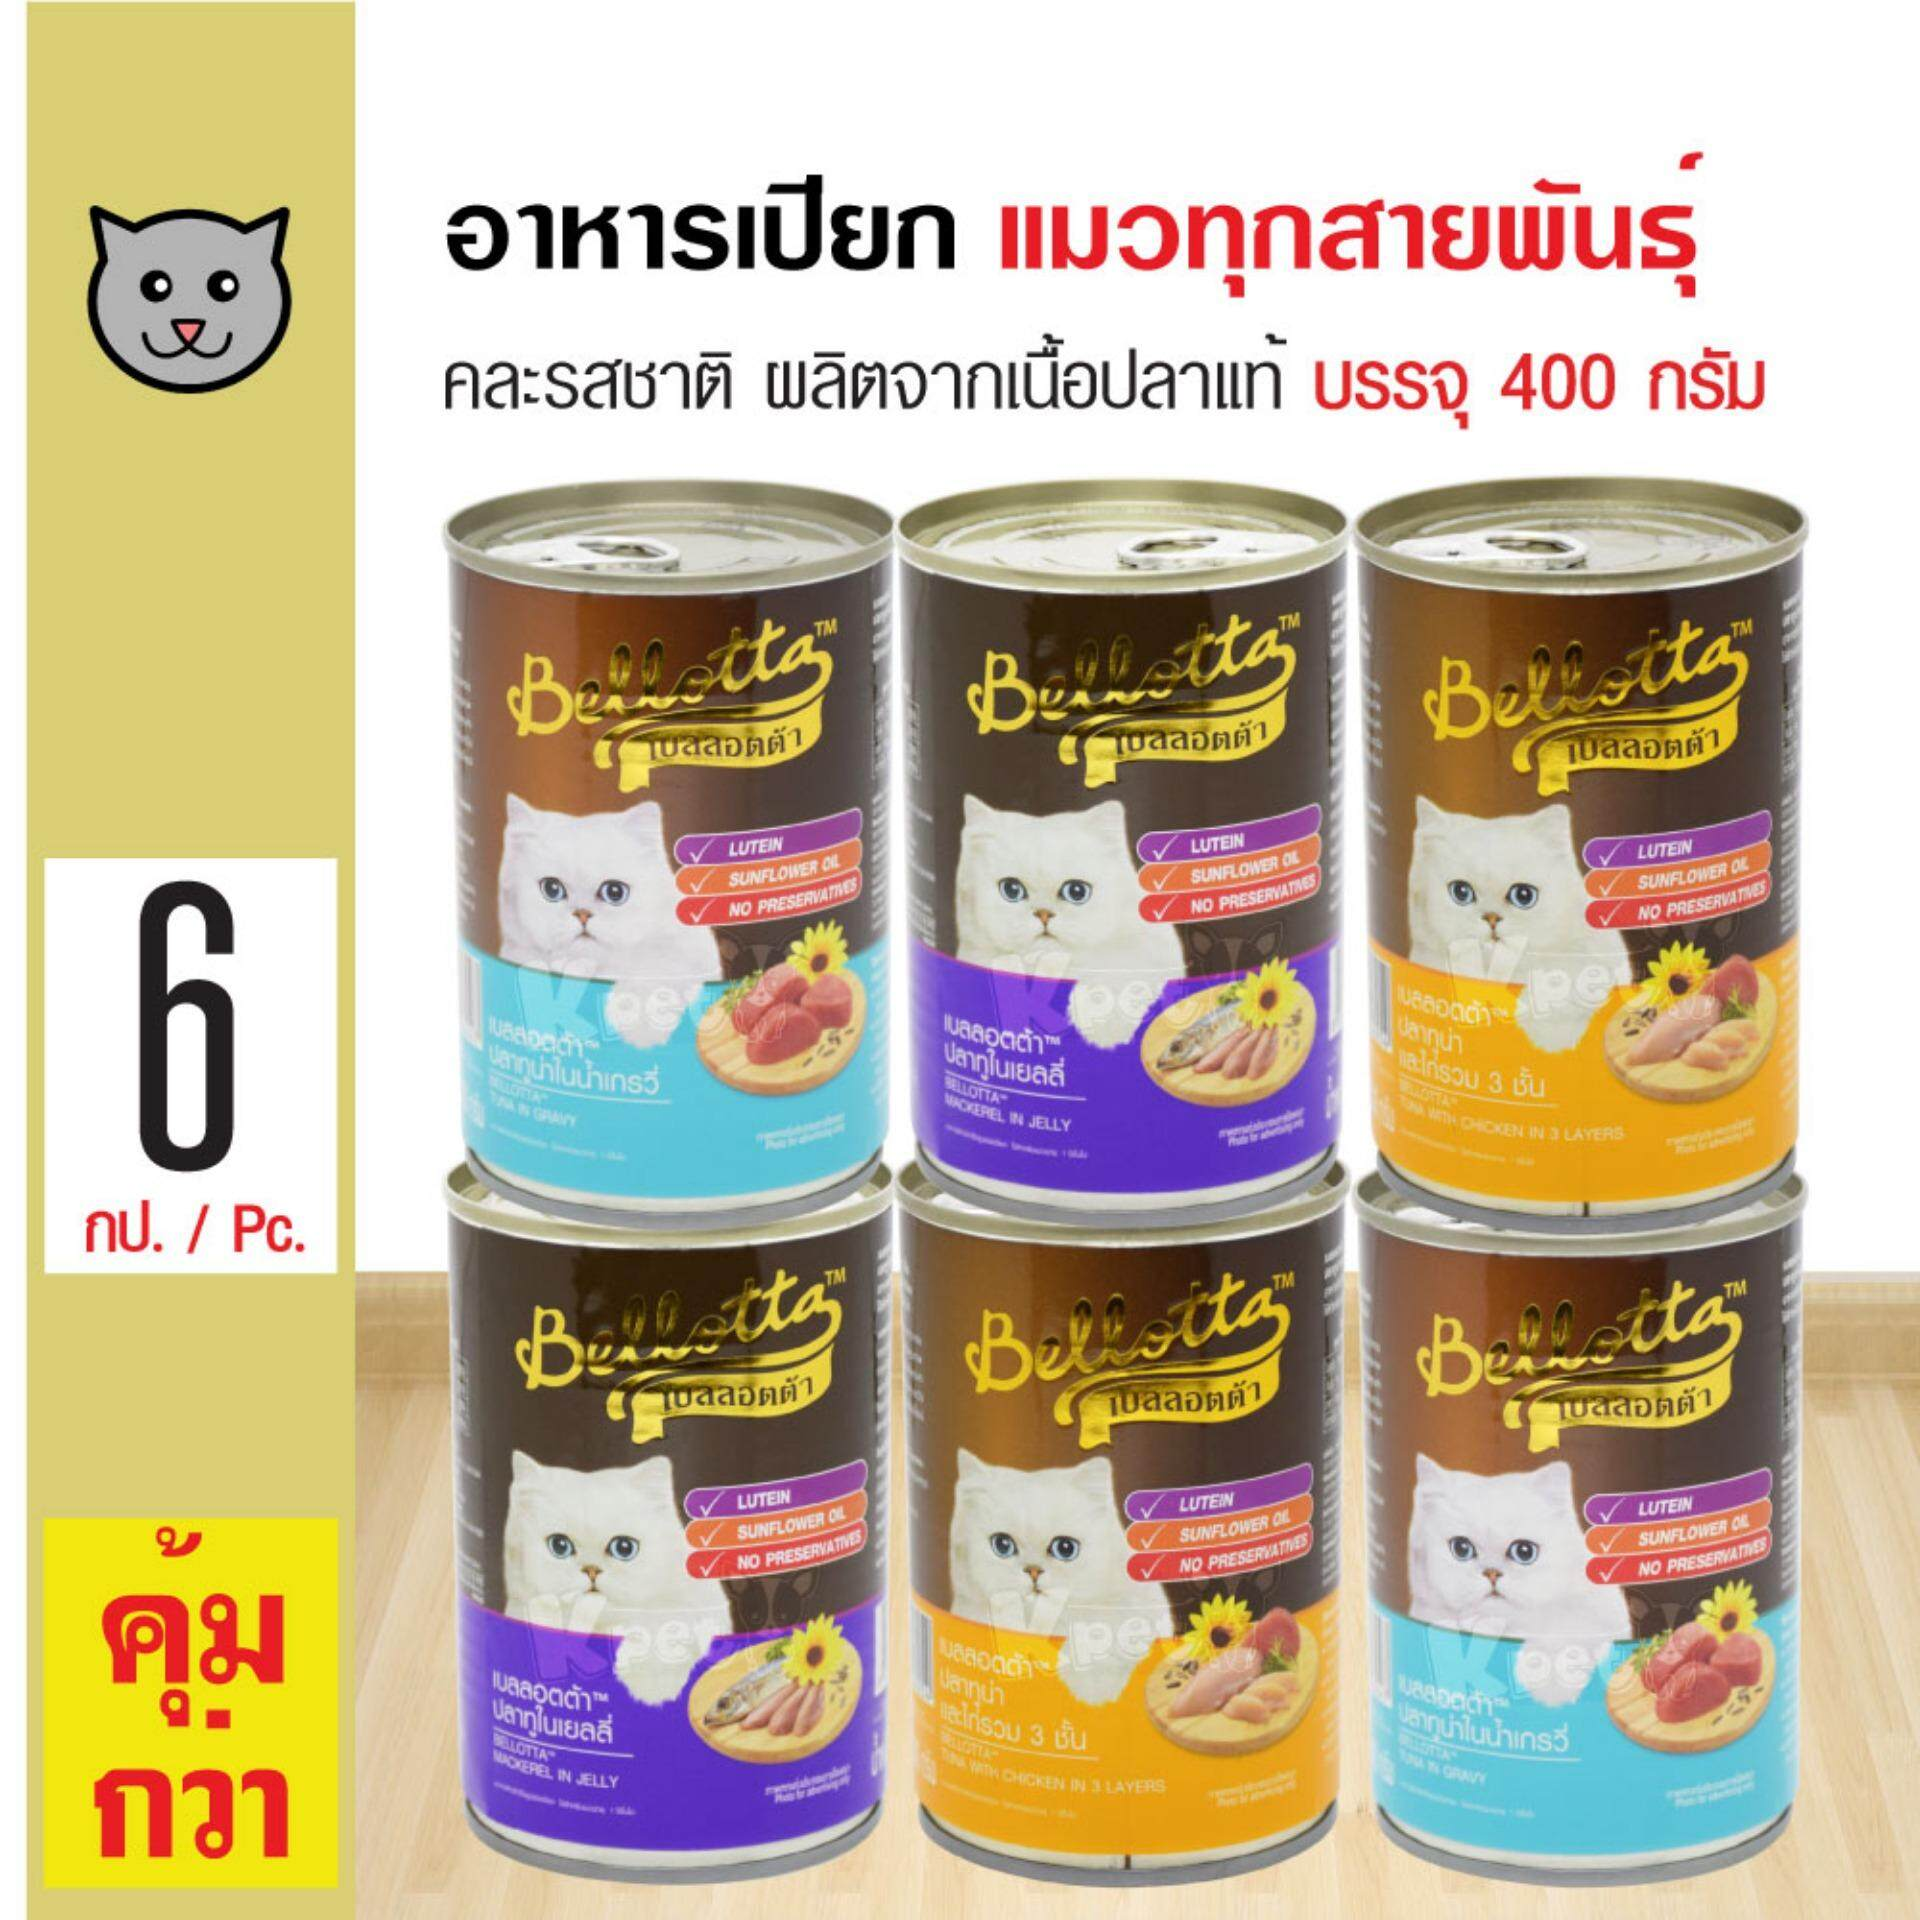 Bellotta Cat Cans อาหารเปียก คละรสชาติ สูตรเจลลี่และเกรวี่ สำหรับแมวทุกสายพันธุ์ ขนาด 400 กรัม X 6 กระป๋อง By Kpet.